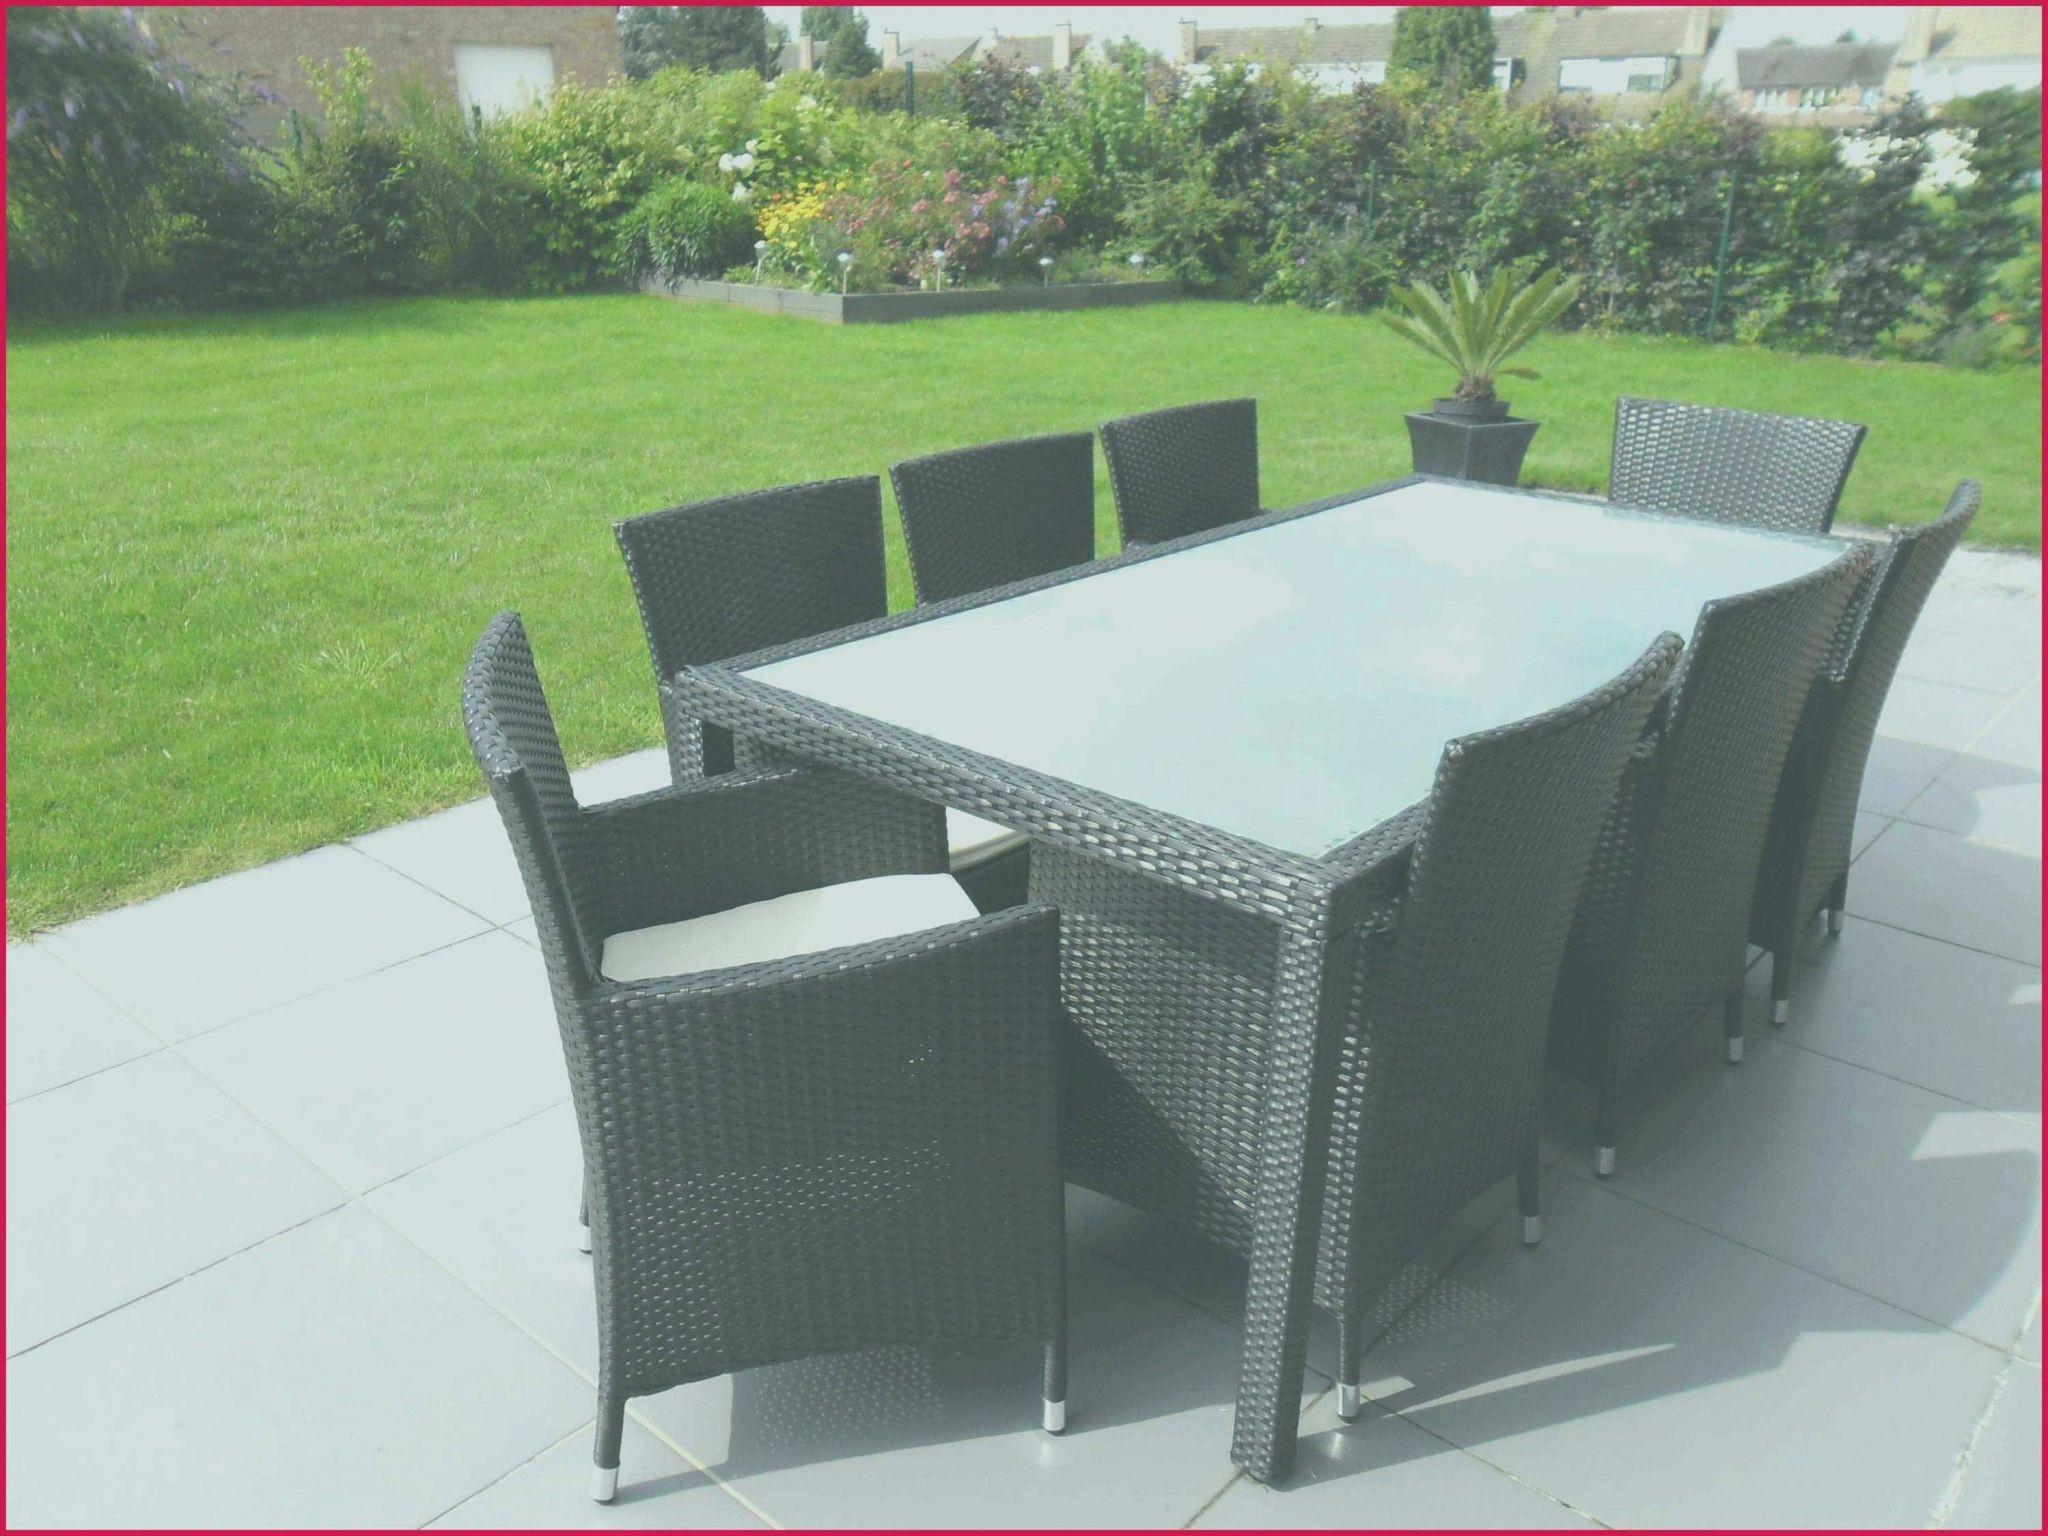 housse meuble de jardin ensemble de jardin 4 personnes ou housse meuble de jardin luxe of housse meuble de jardin